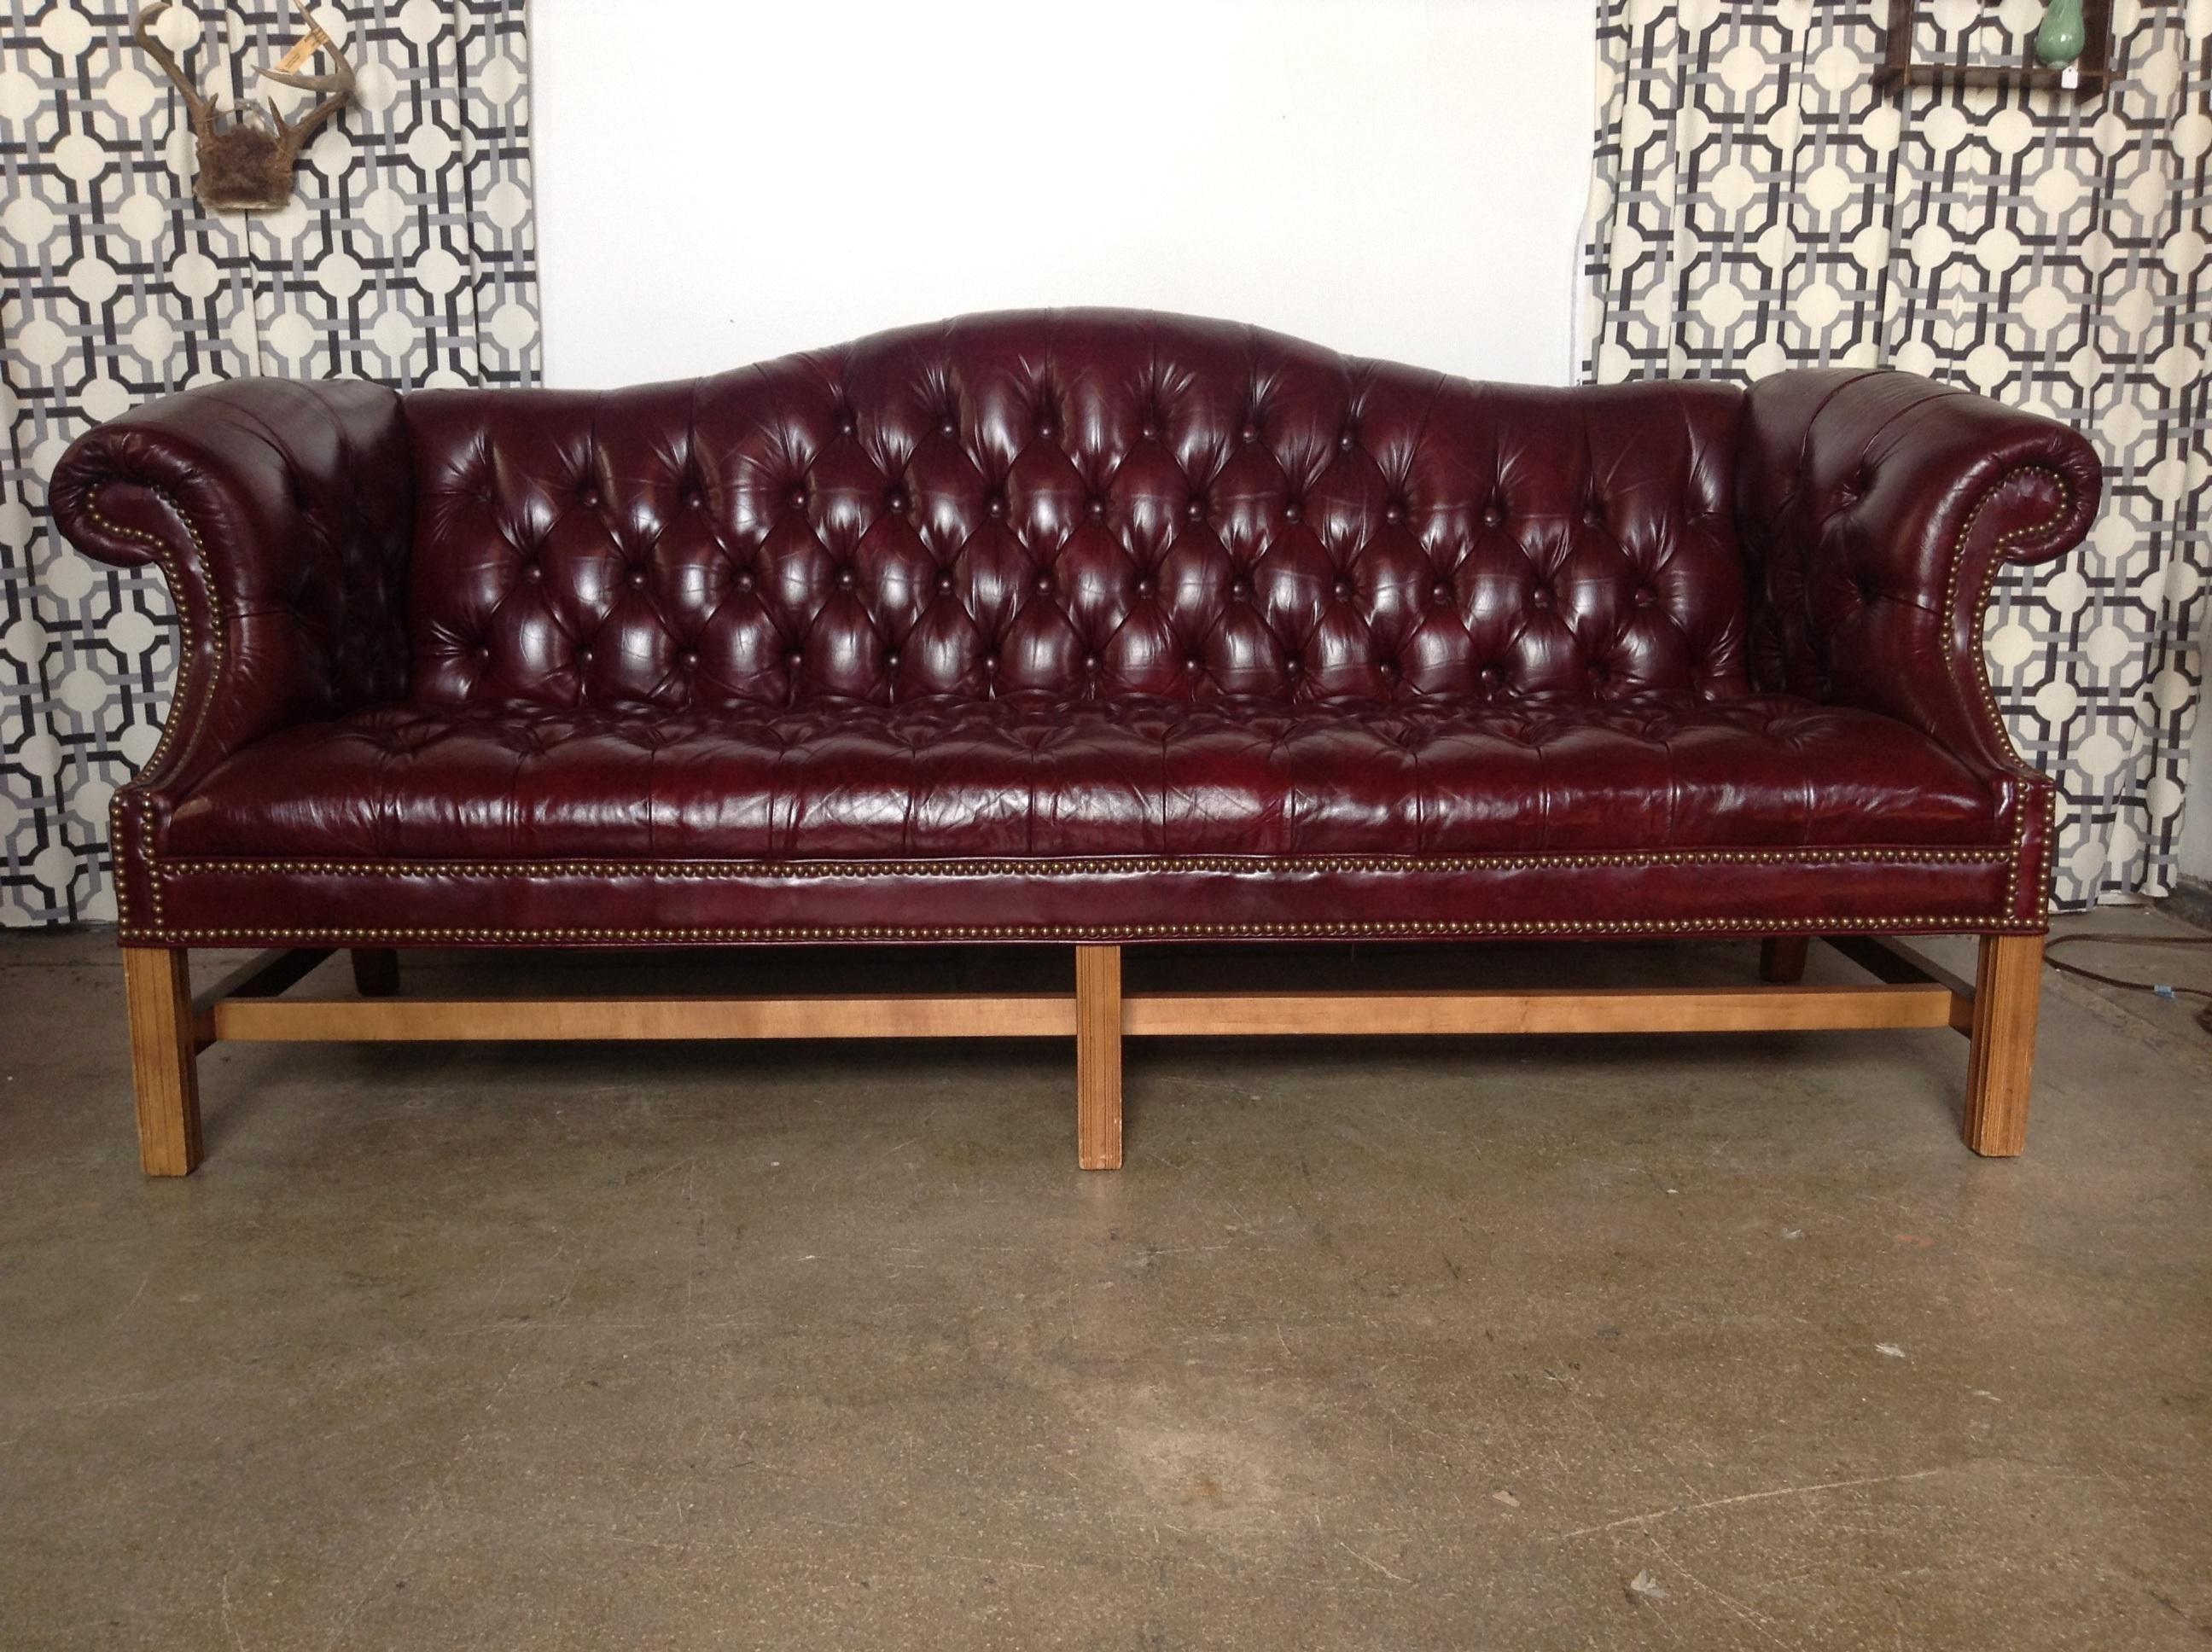 Sofa : Classic Sofas For Sale Room Design Plan Modern To Classic Within Classic Sofas For Sale (Photo 2 of 20)